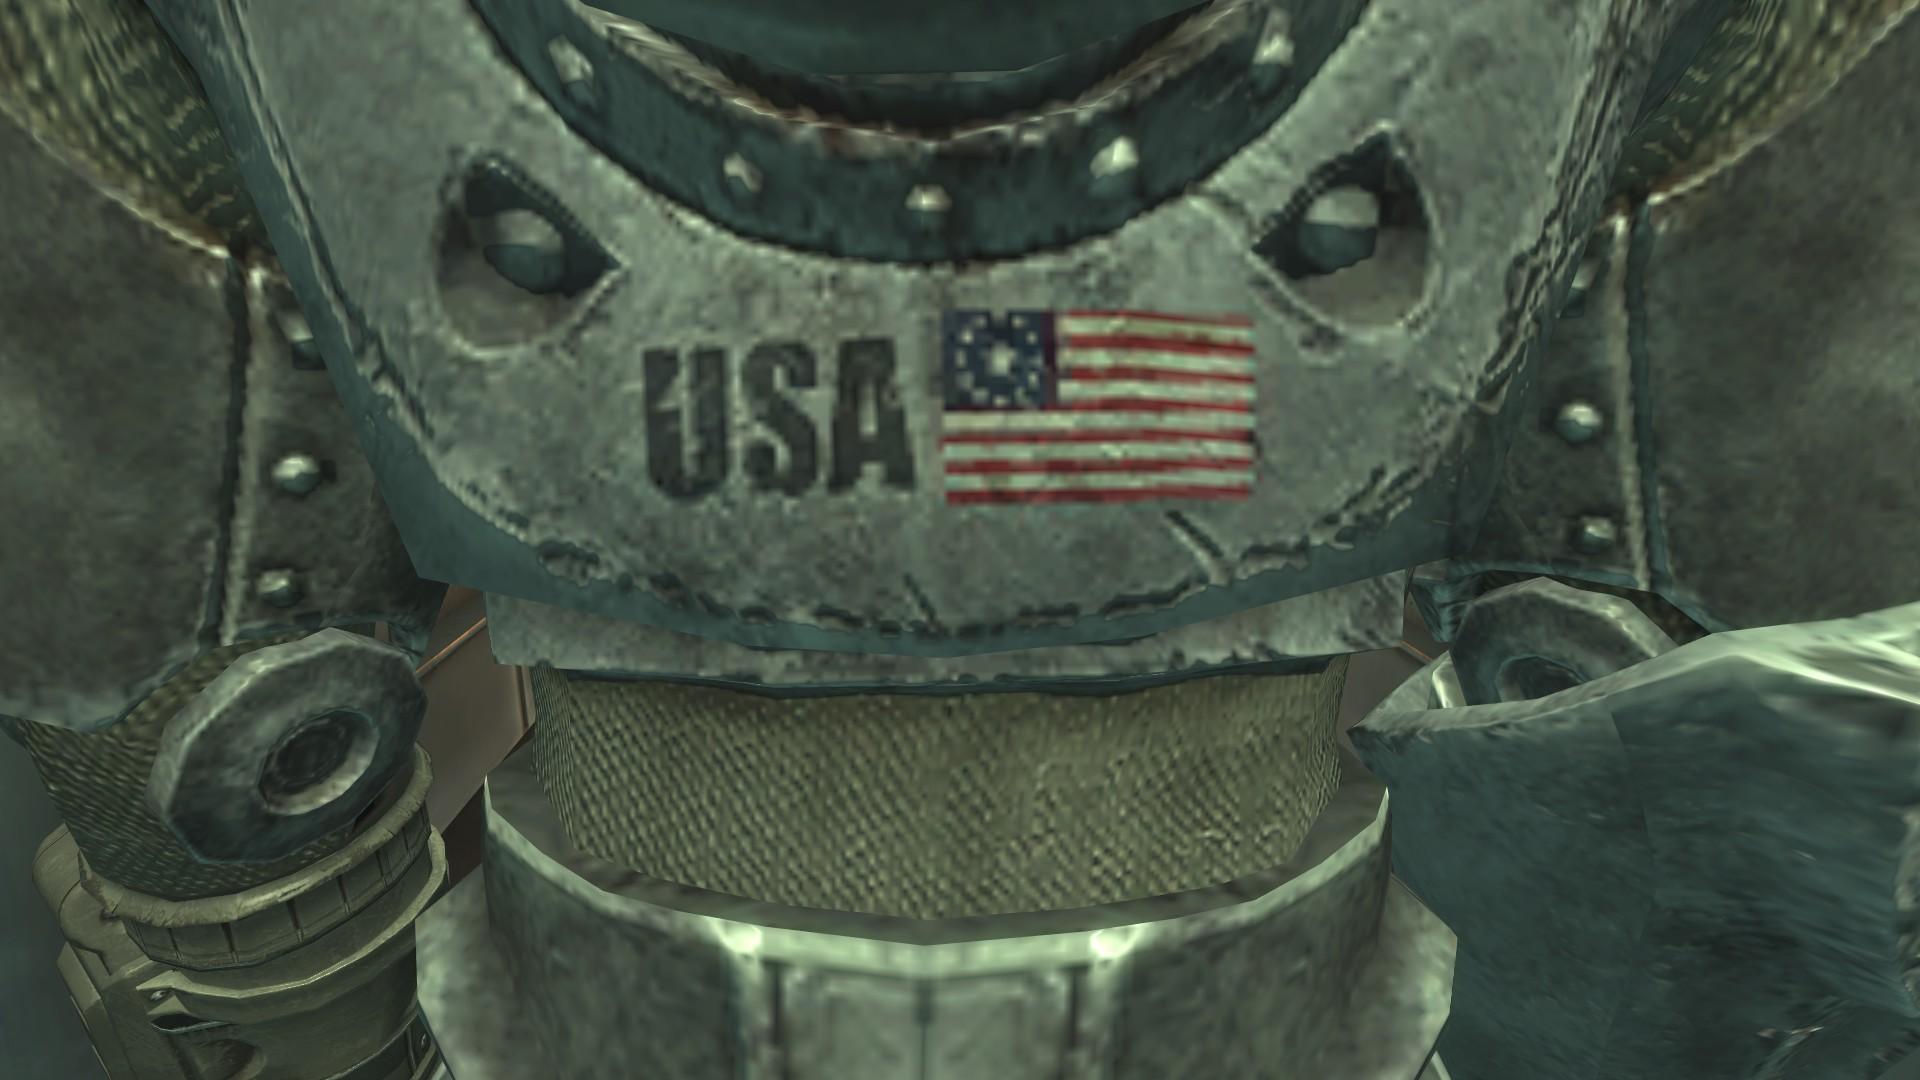 OA T51b worn US flag